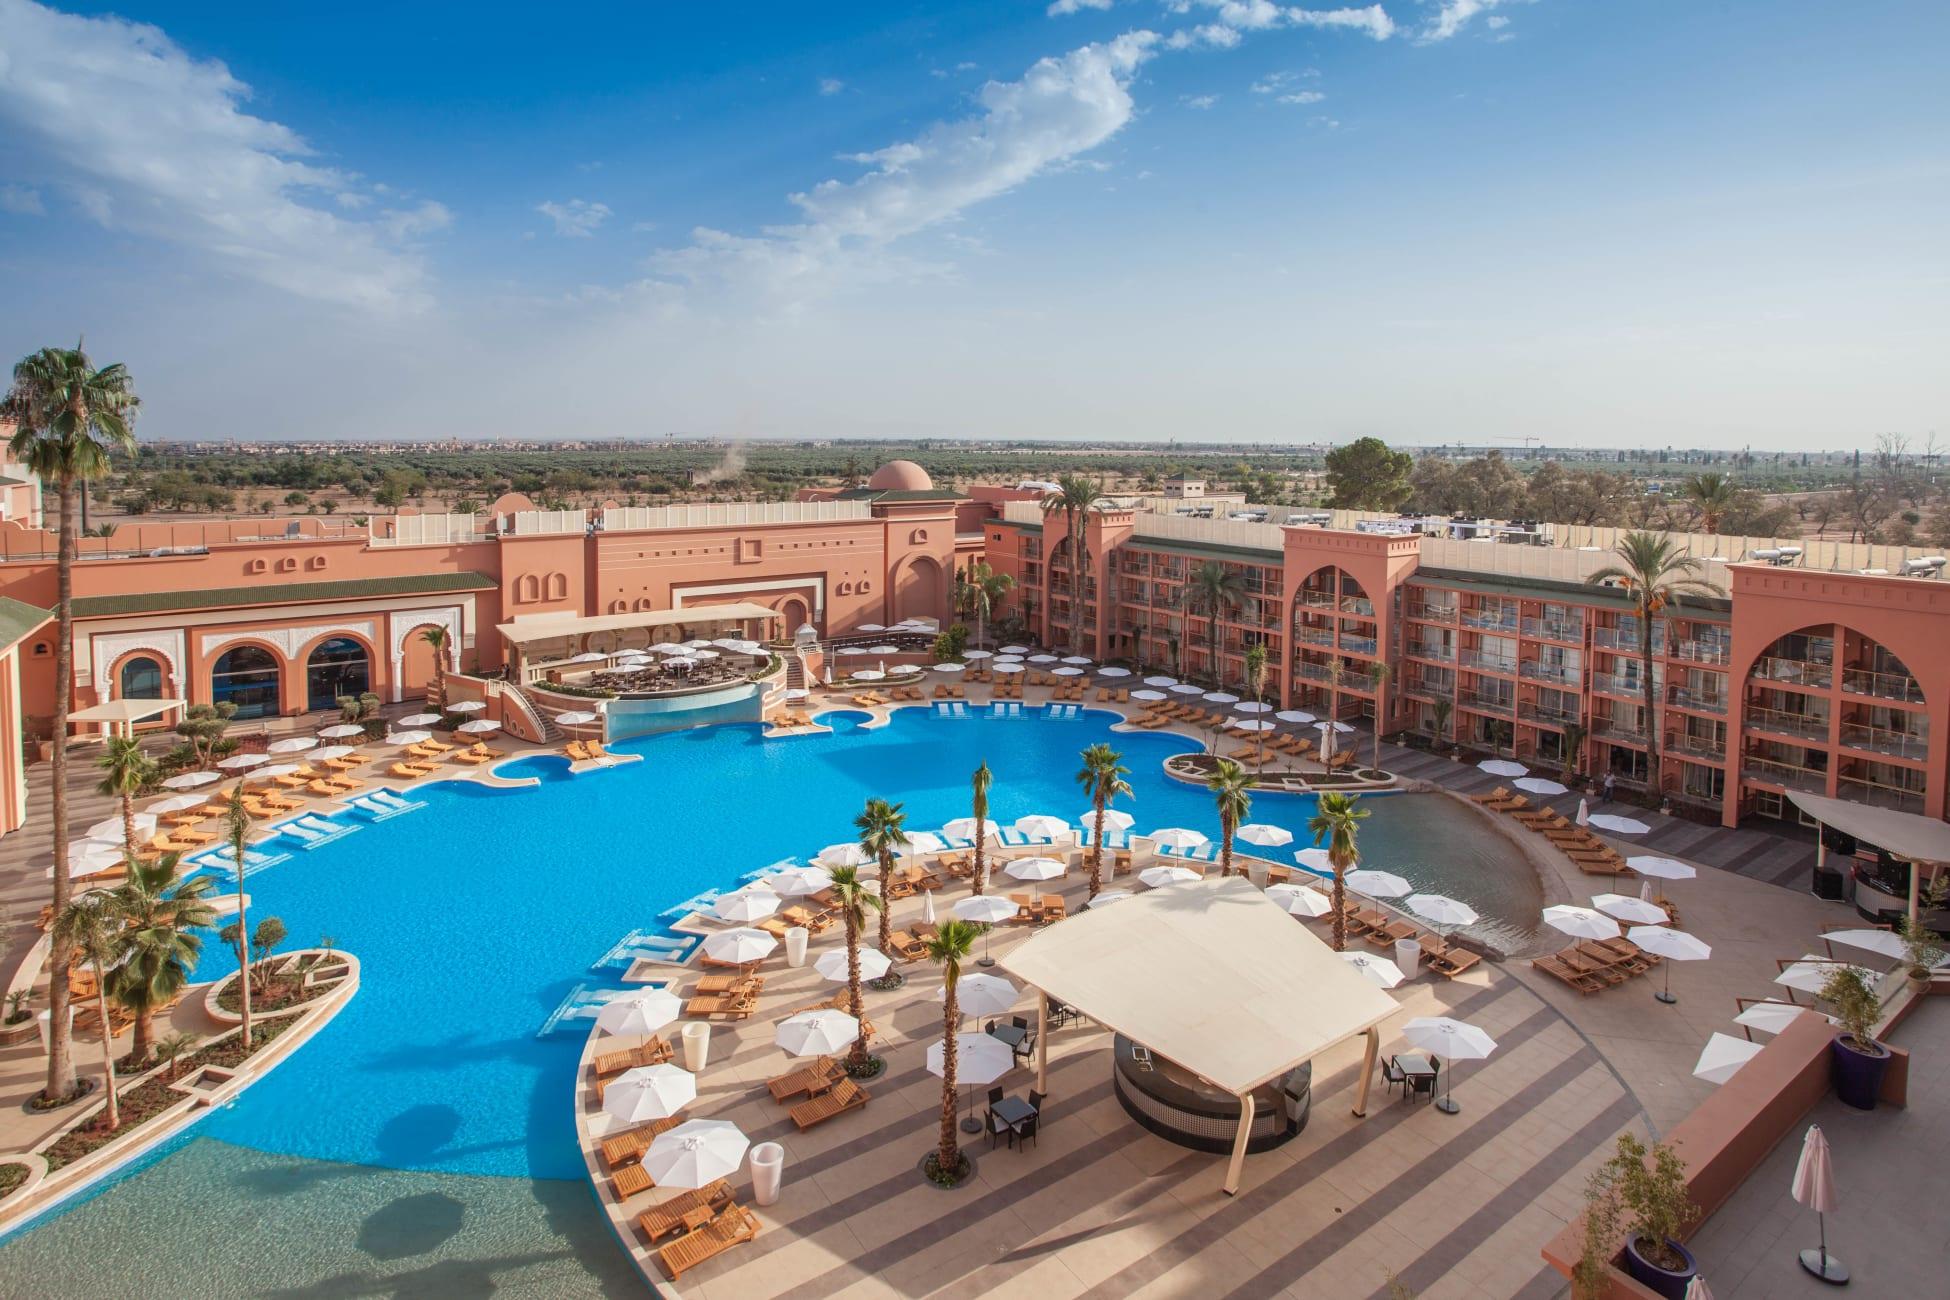 Otel Savoy Le Grand Hotel, Marakeş - Trivago.tr pour Jardin De La Koutoubia